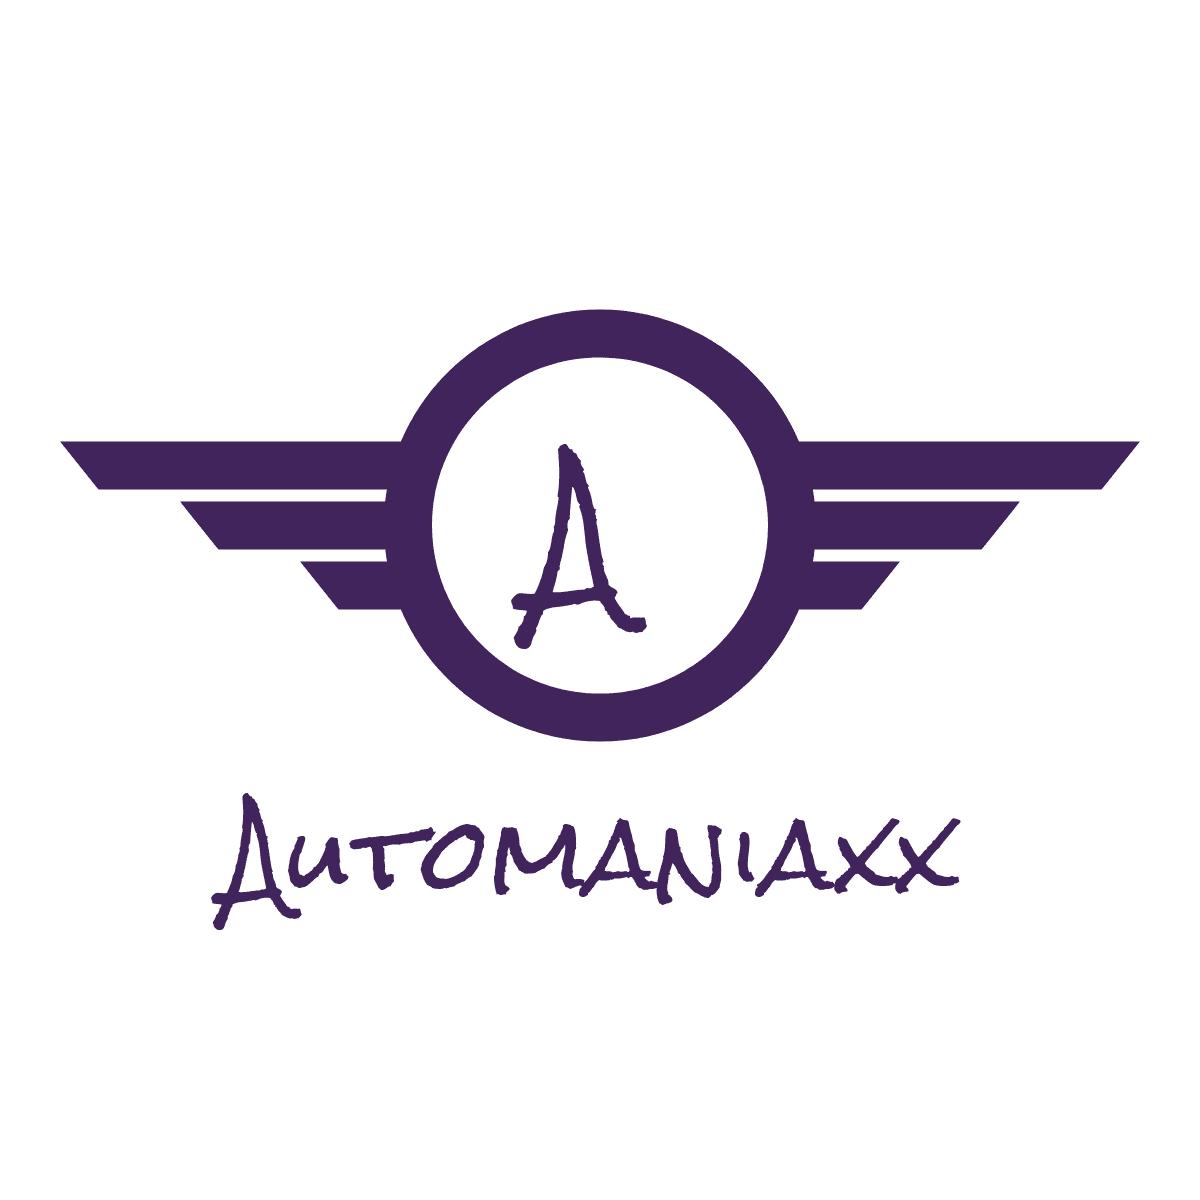 AUTOMANIAXX image